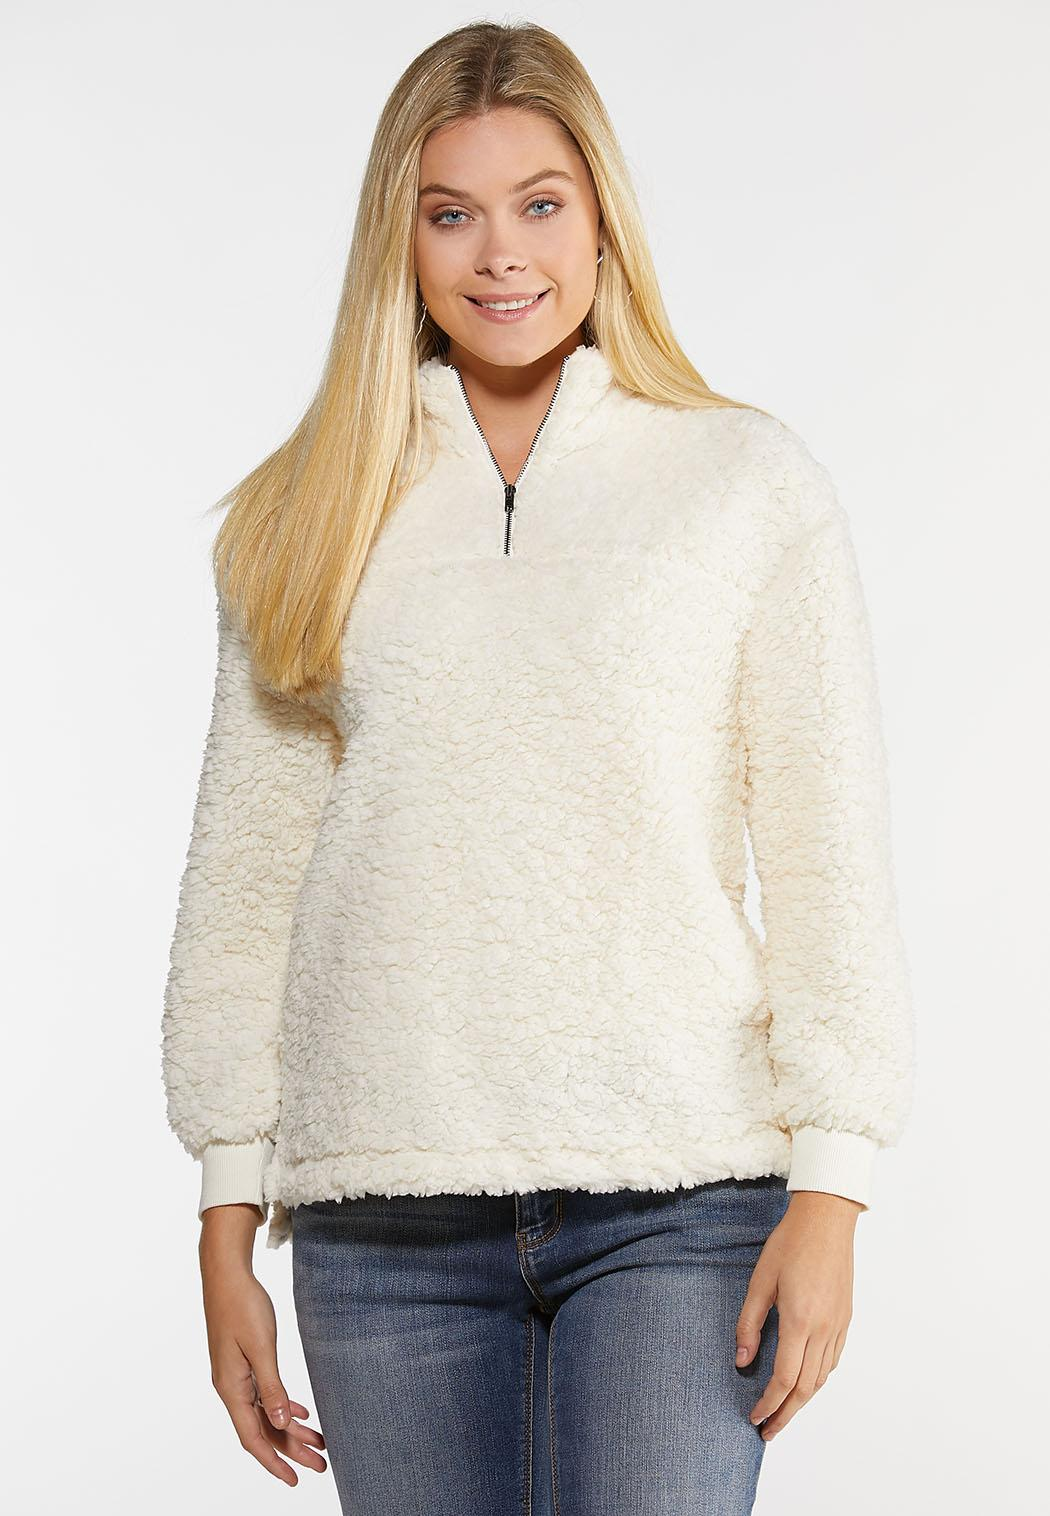 Plus Size Cozy Fleece Pullover Top